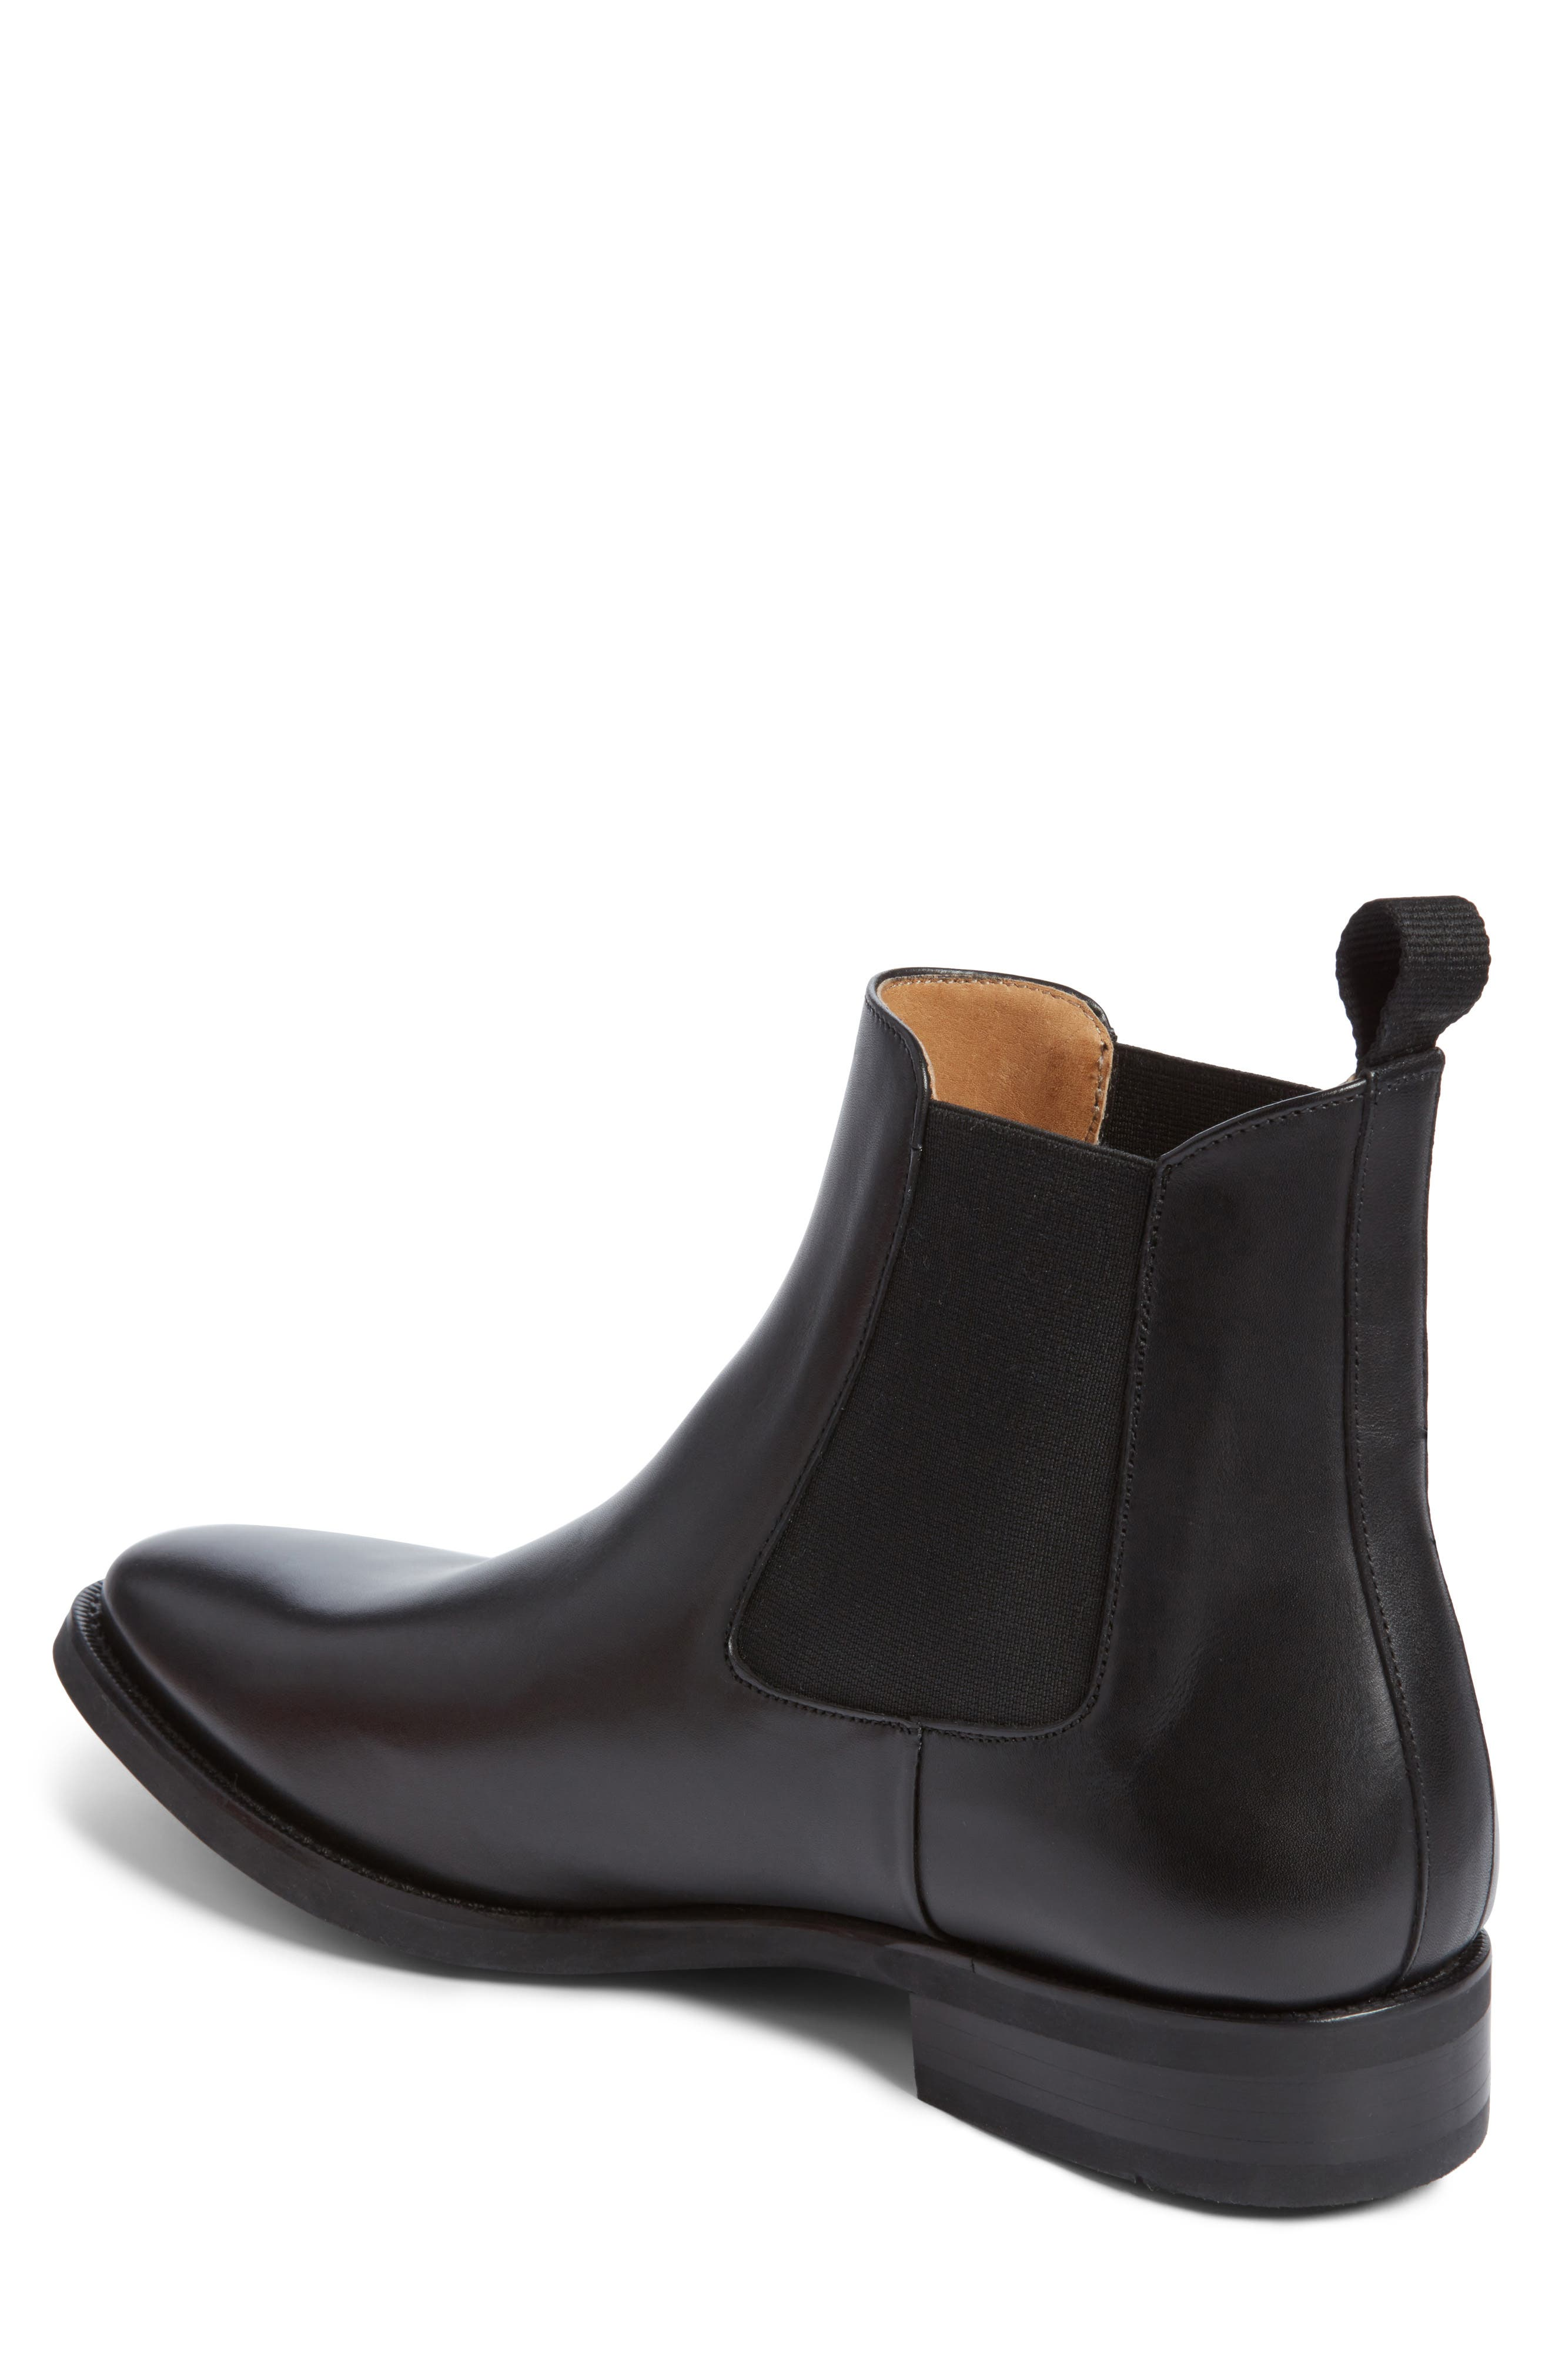 JACK ERWIN, Ellis Water Resistant Chelsea Boot, Alternate thumbnail 2, color, BLACK LEATHER